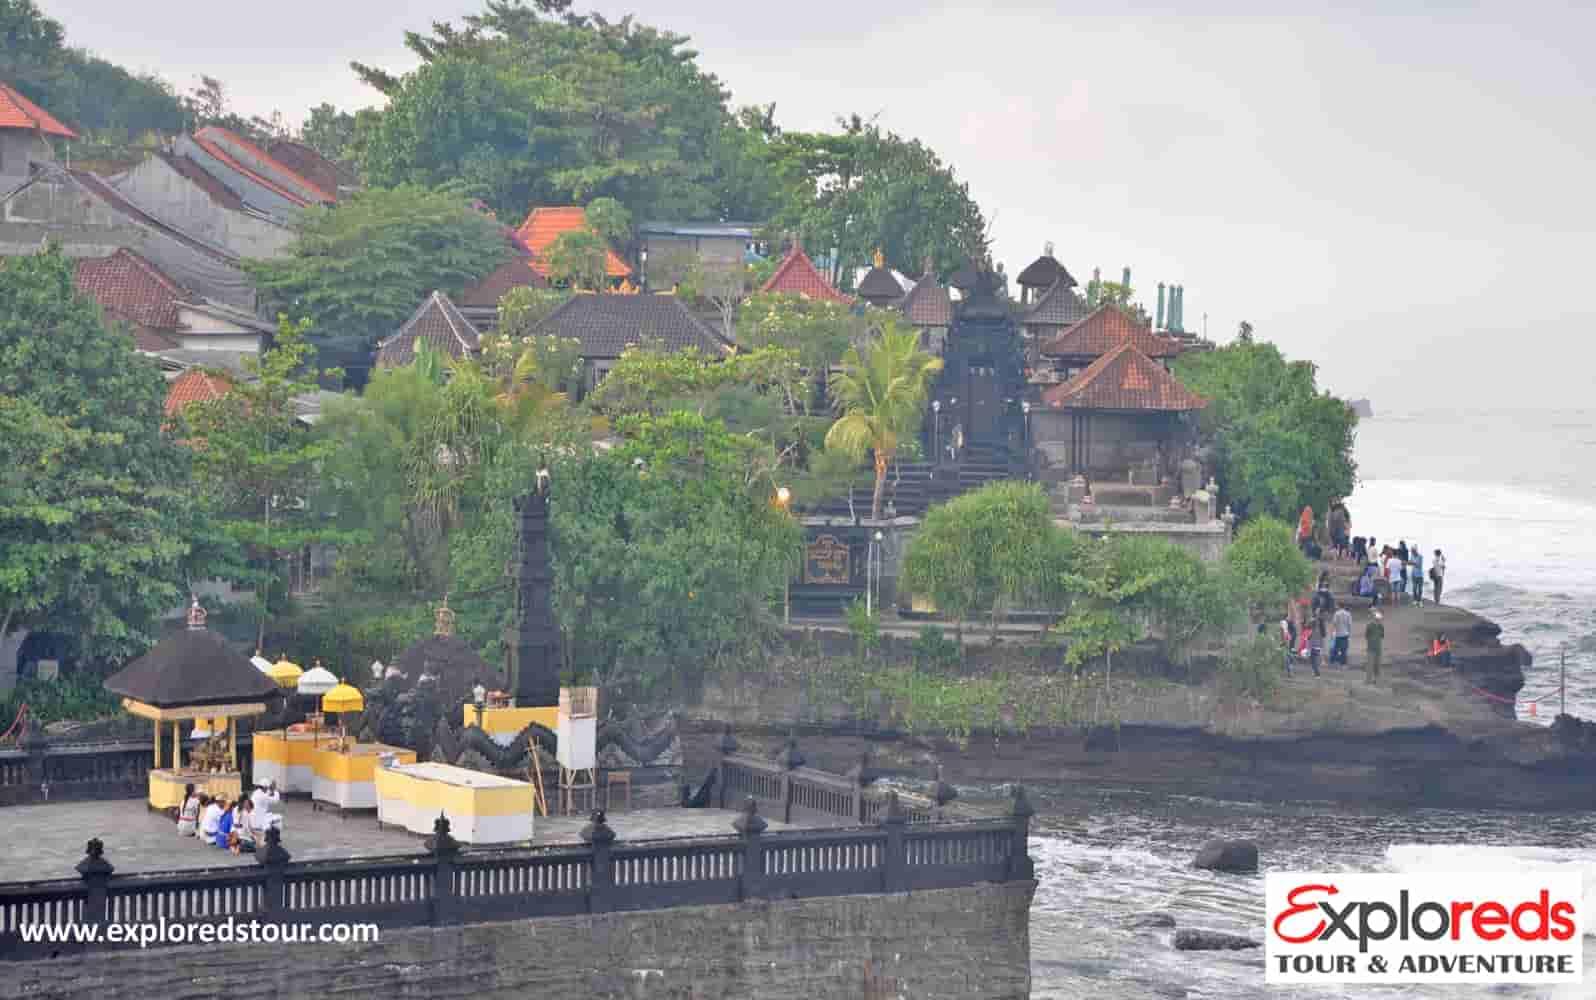 Paket Wisata Tour Bali Ekonomis 3 Hari 2 Malam Exploreds Tour